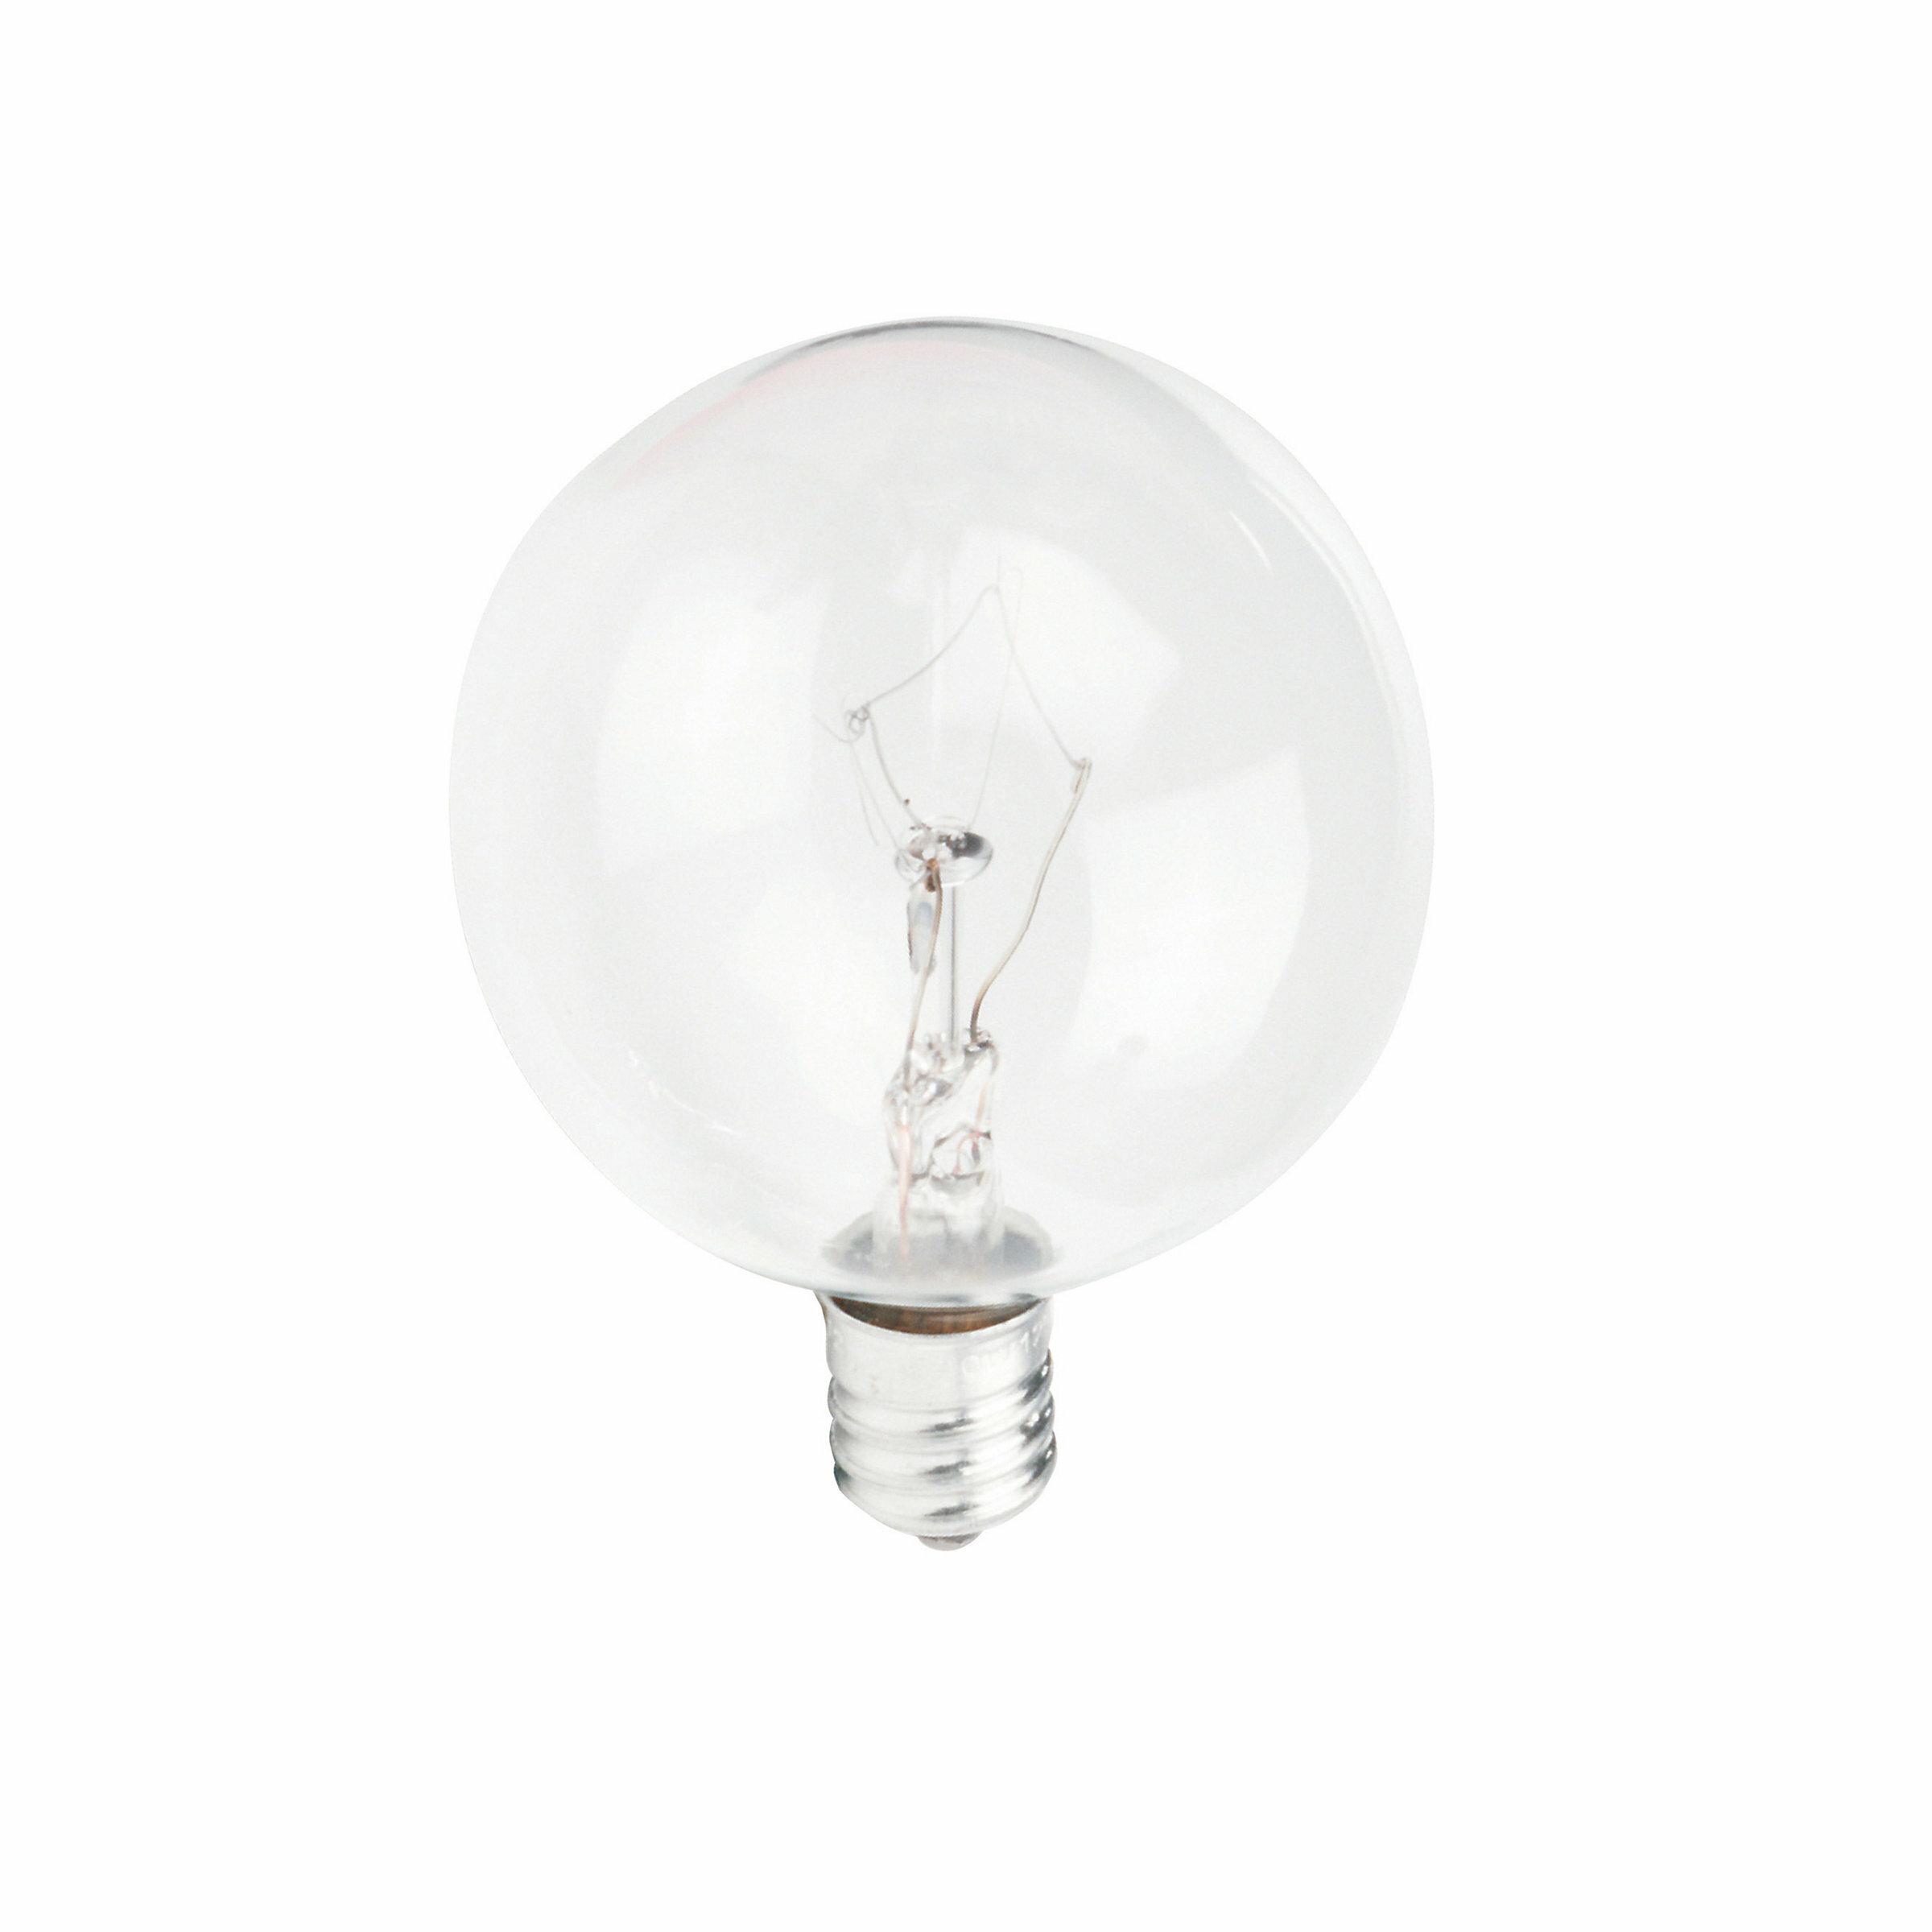 Philips 40 Watt G16 5 Incandescent Dimmable Light Bulb Warm White 2700k E12 Candelabra Base Reviews Wayfair